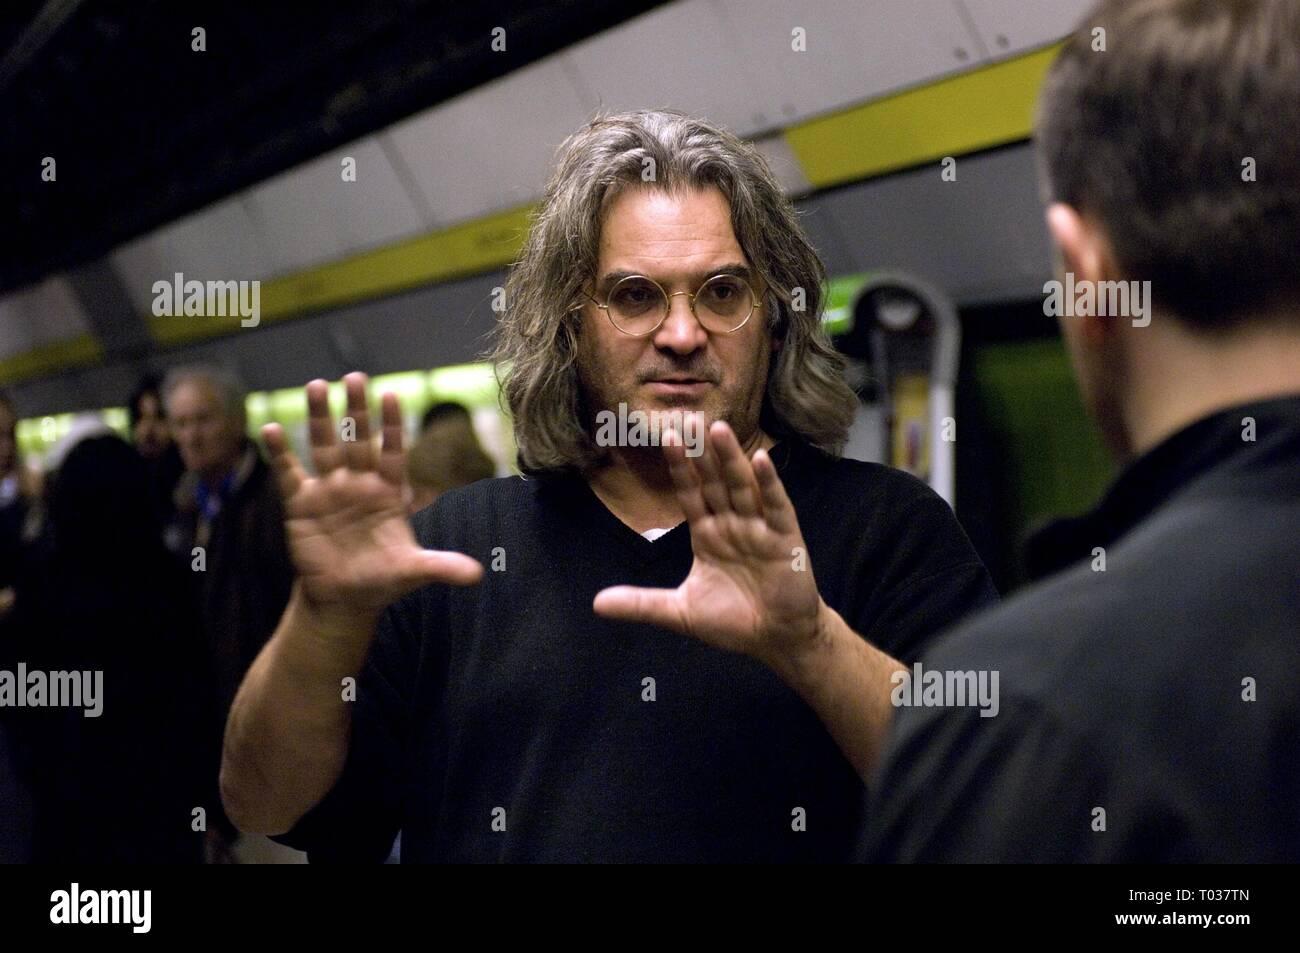 Paul Greengrass The Bourne Ultimatum 2007 Stock Photo Alamy